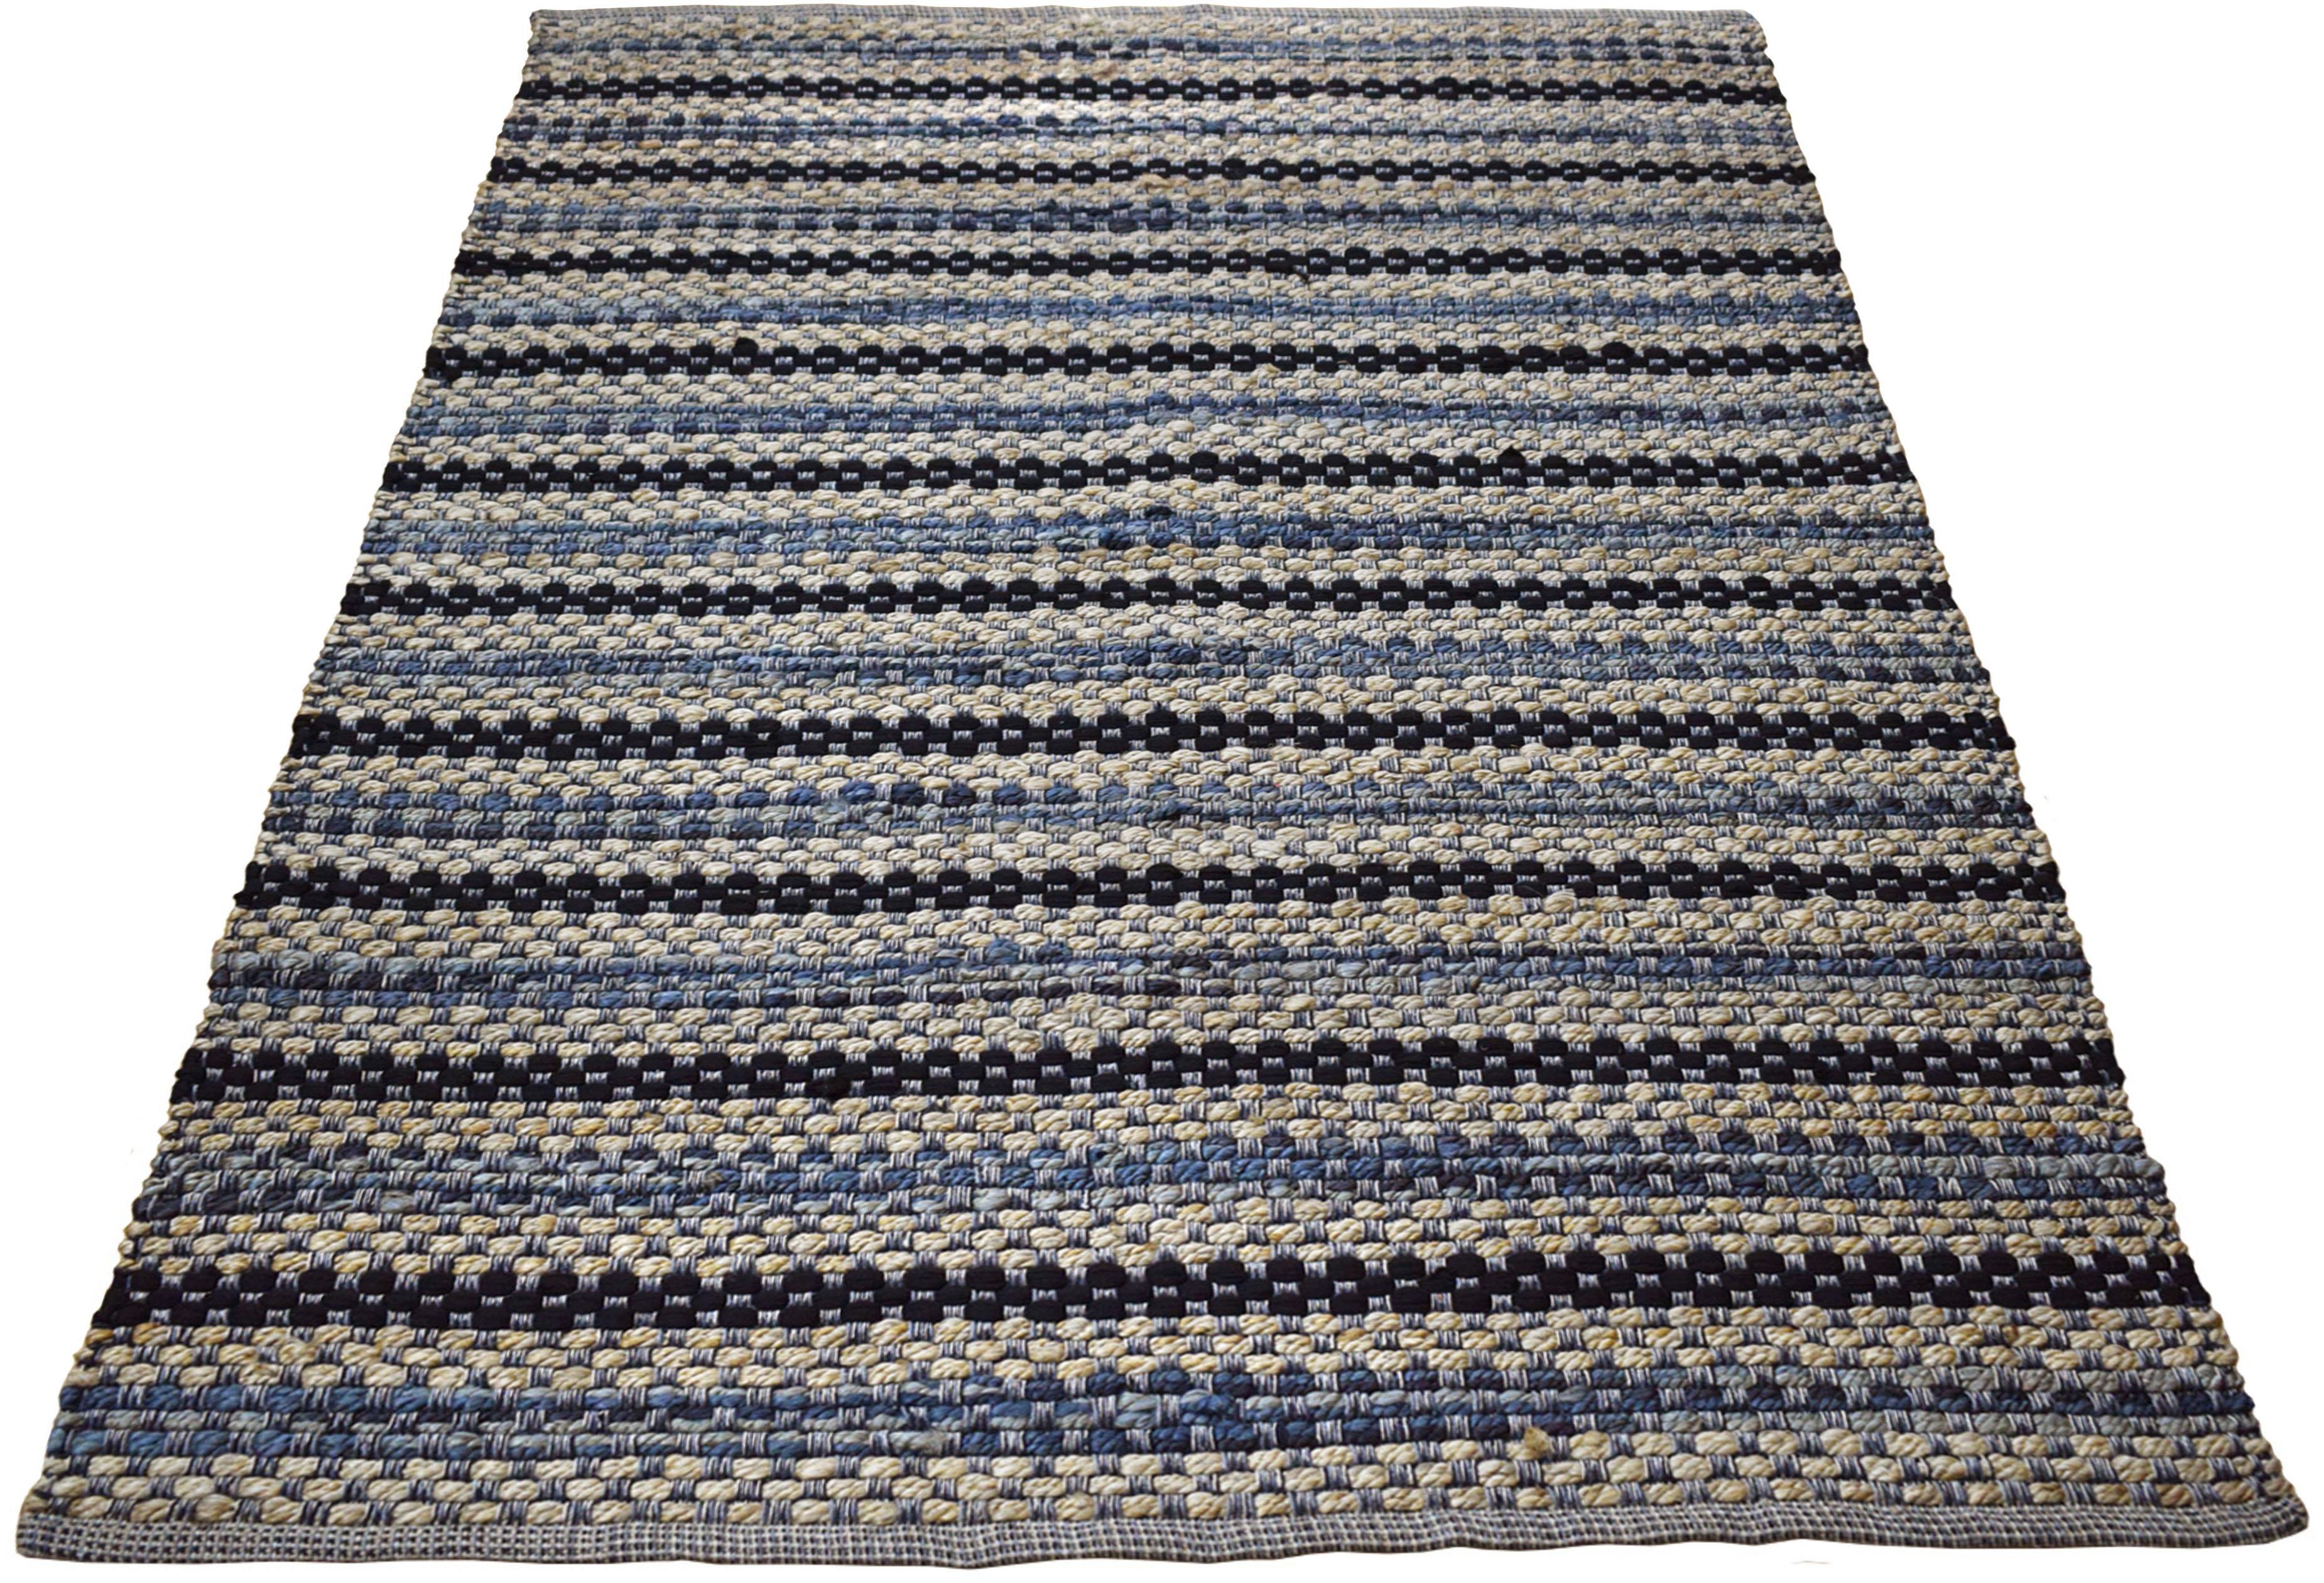 Teppich Olivia andas rechteckig Höhe 14 mm handgewebt